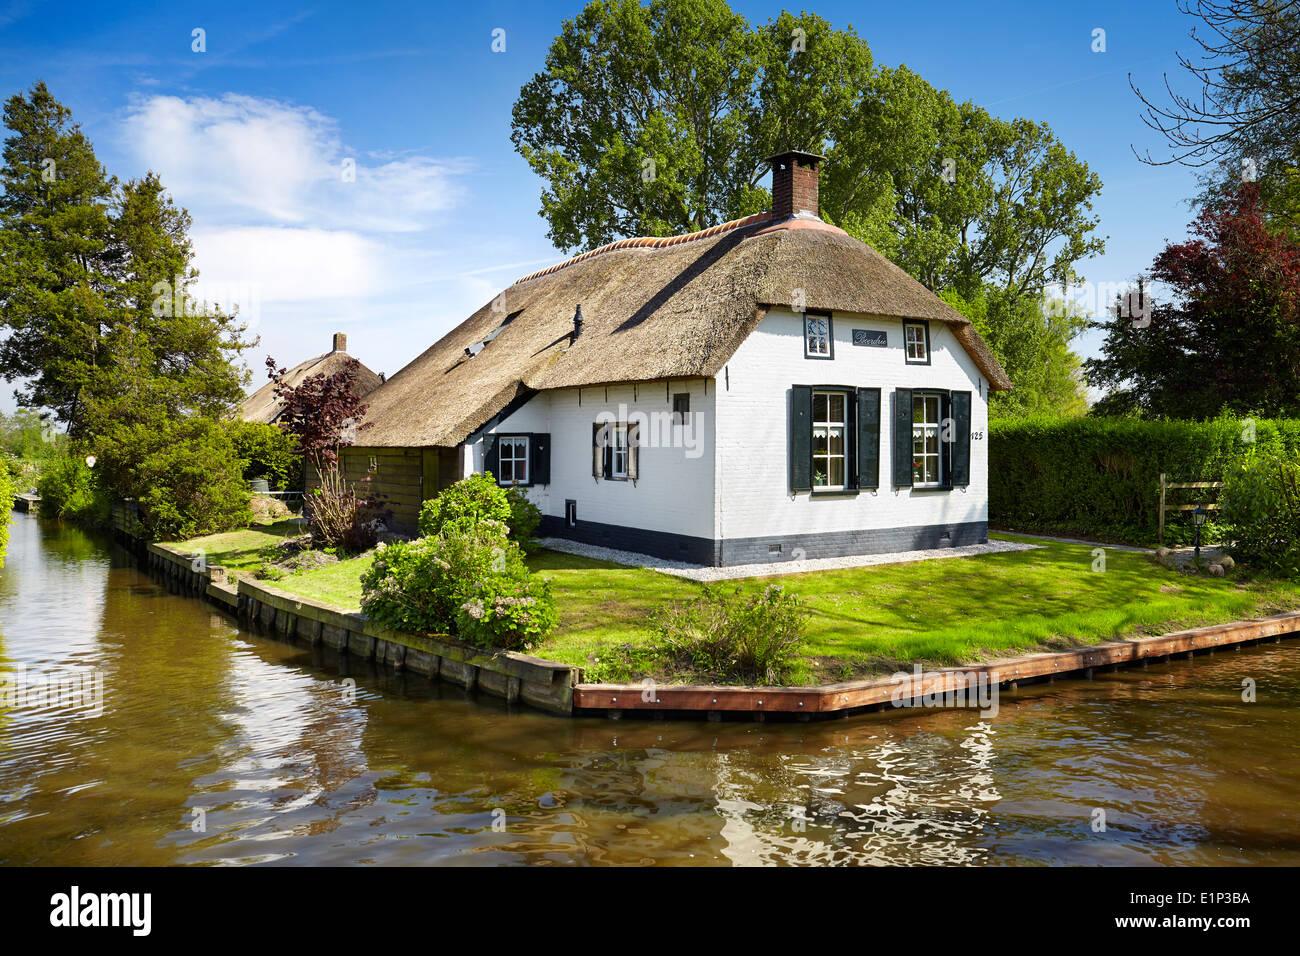 Giethoorn canals village - Holland Netherlands - Stock Image